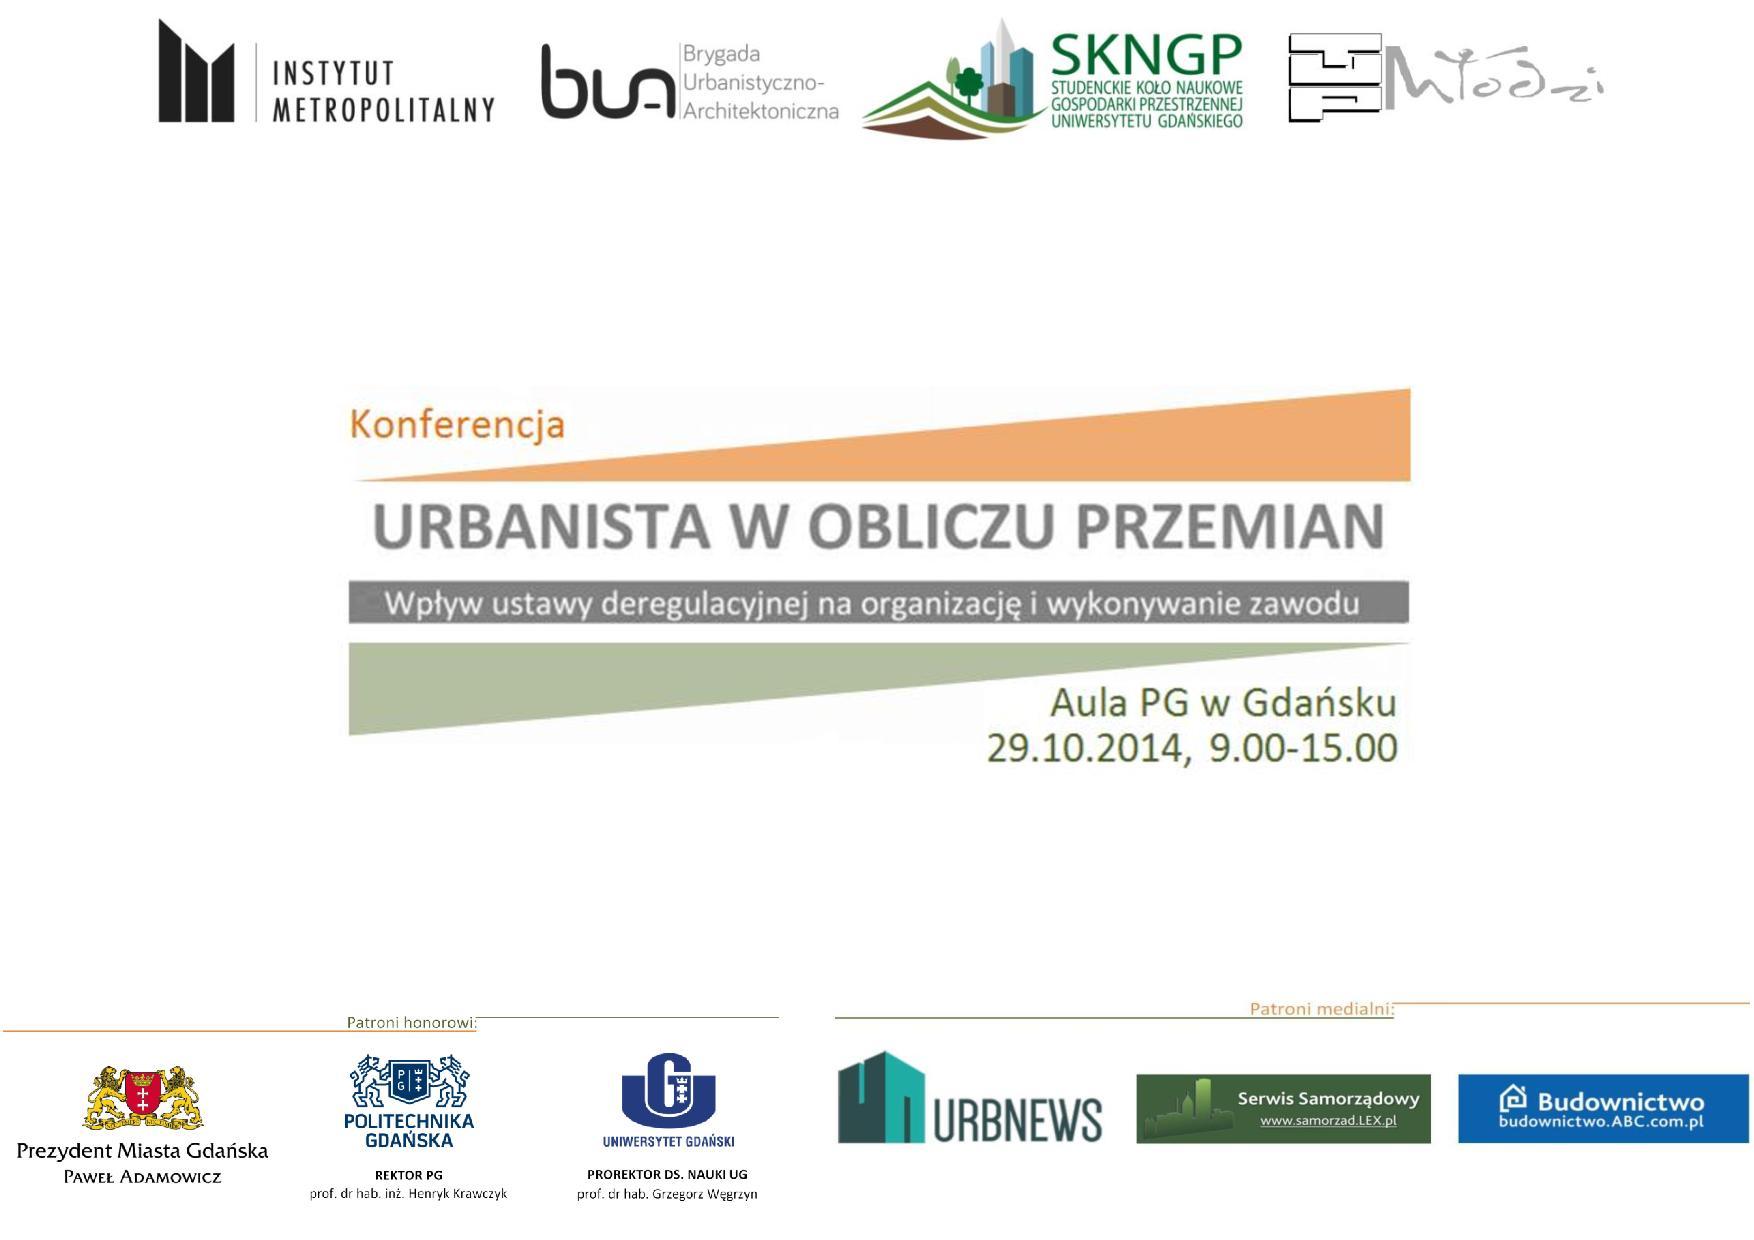 Plakat konferencyjny